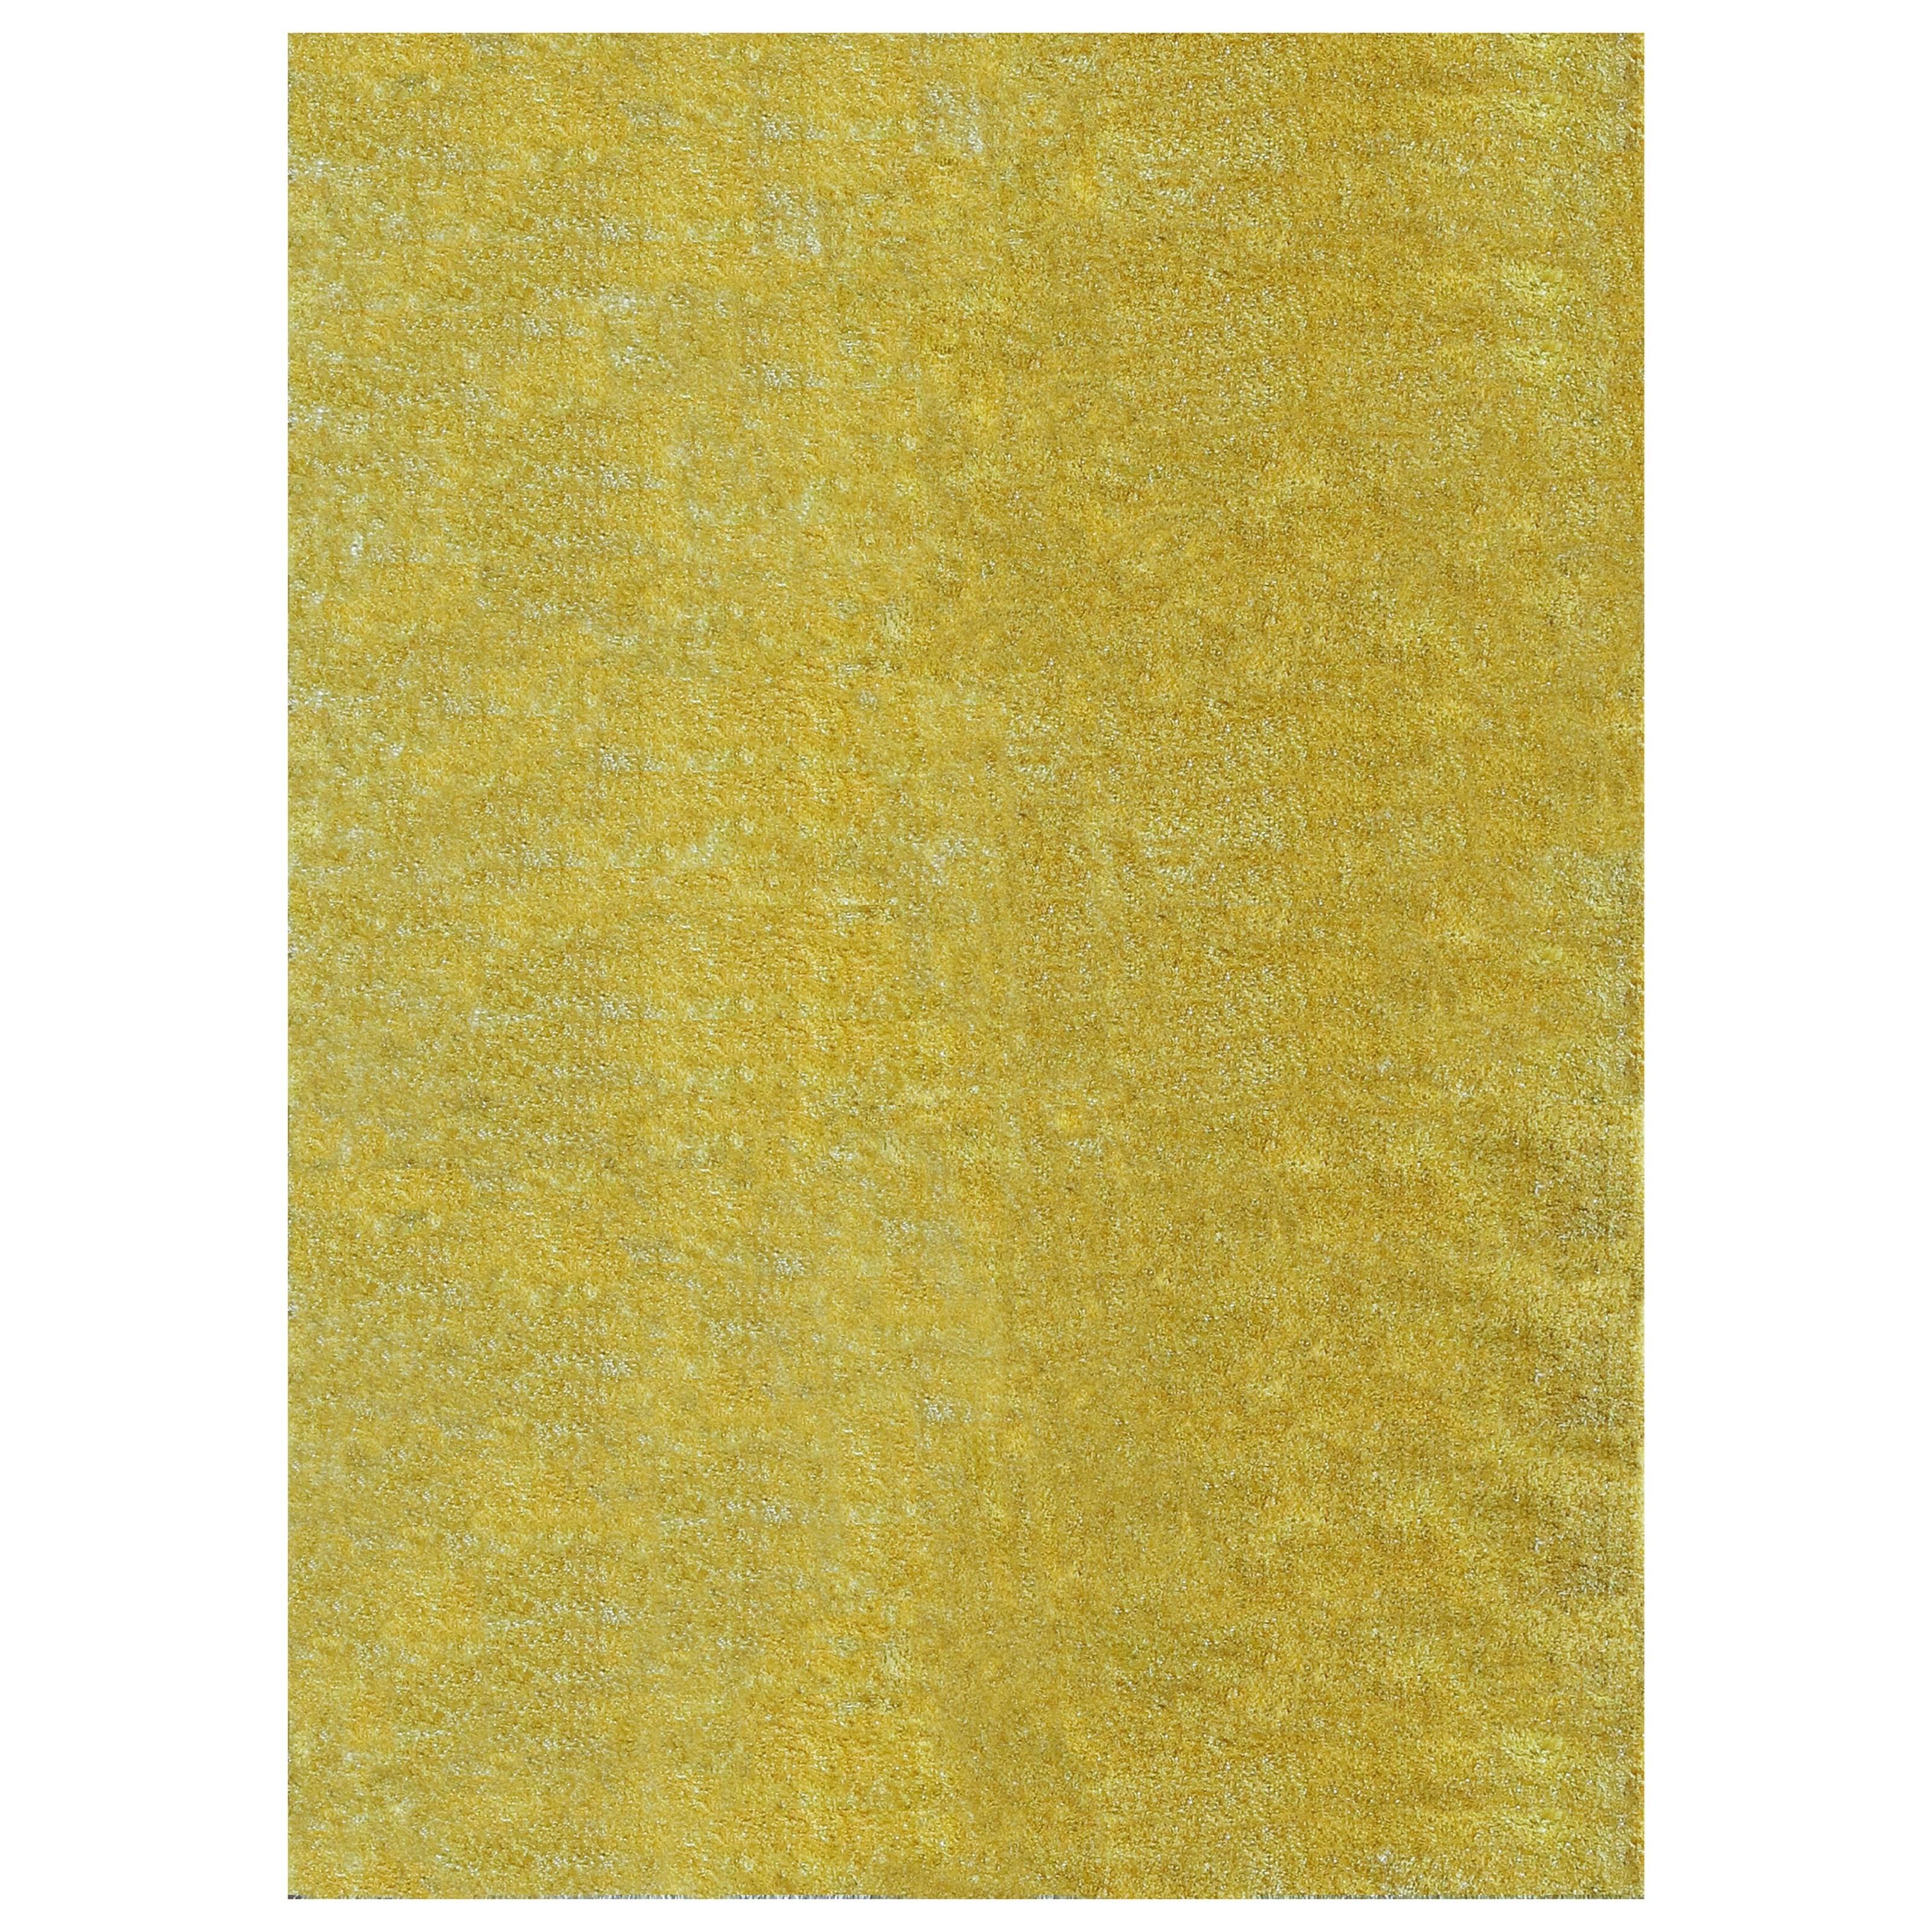 "3'3"" X 5'3"" Marigold Yellow Area Rug"